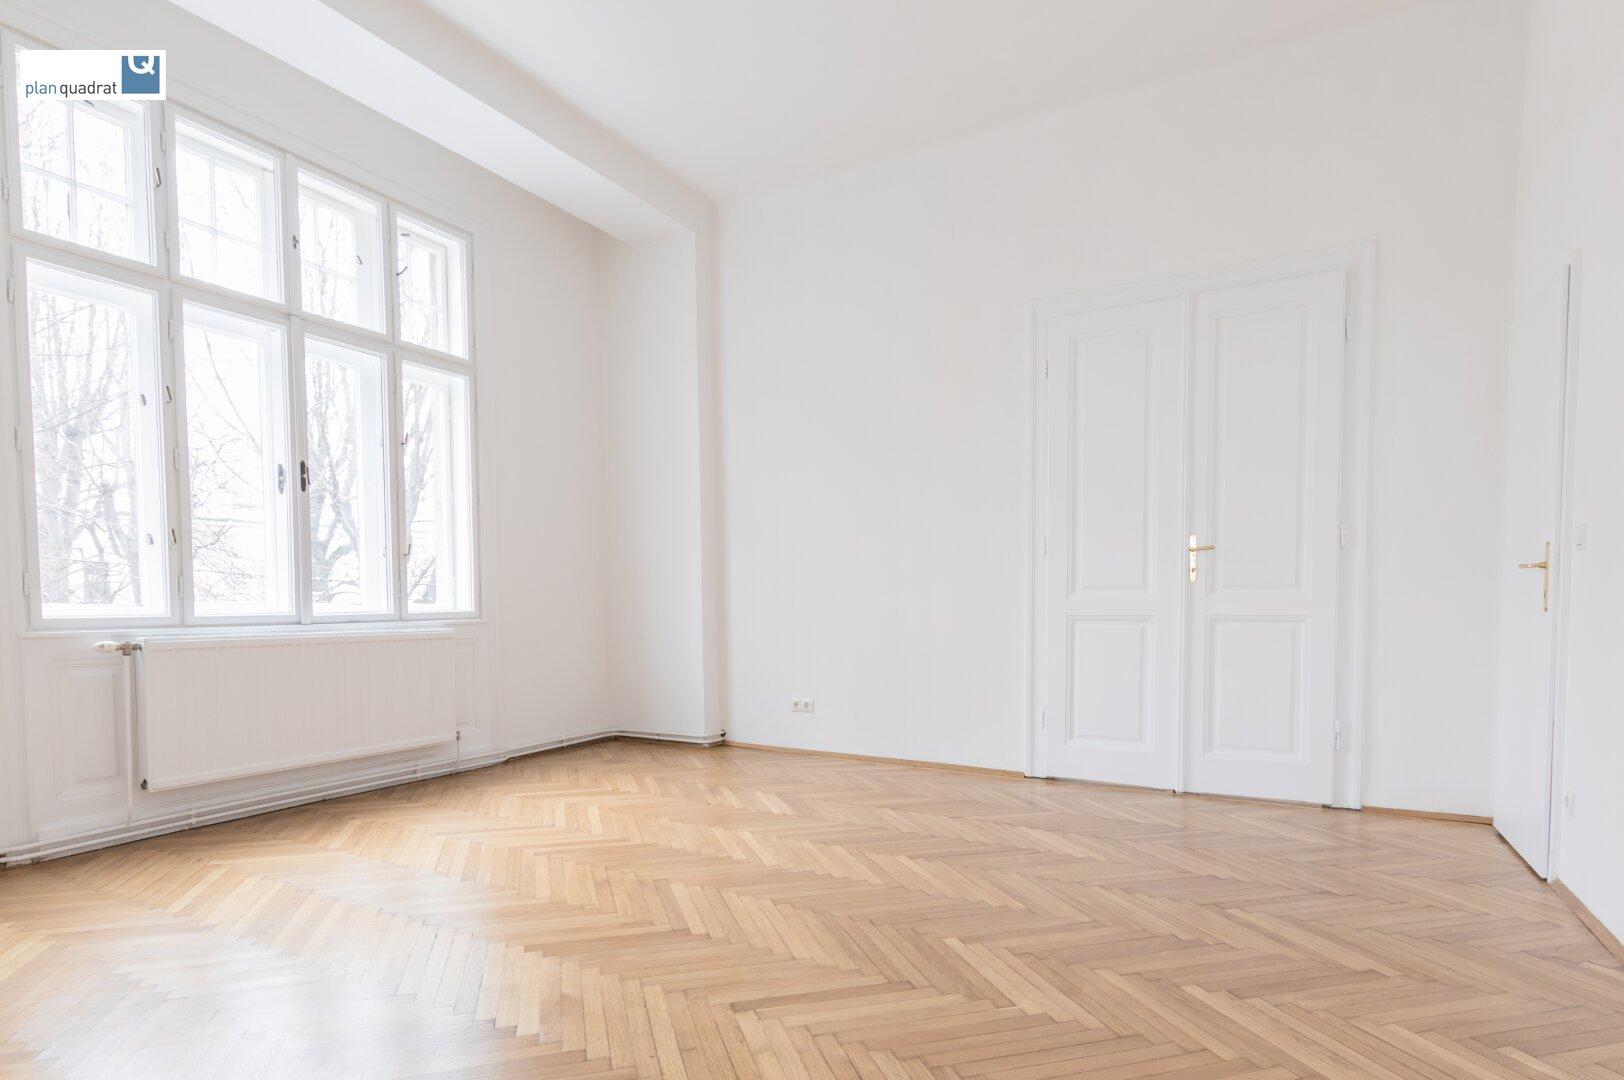 Zimmer 4 (gem. Plan; ca. 21,27 qm)